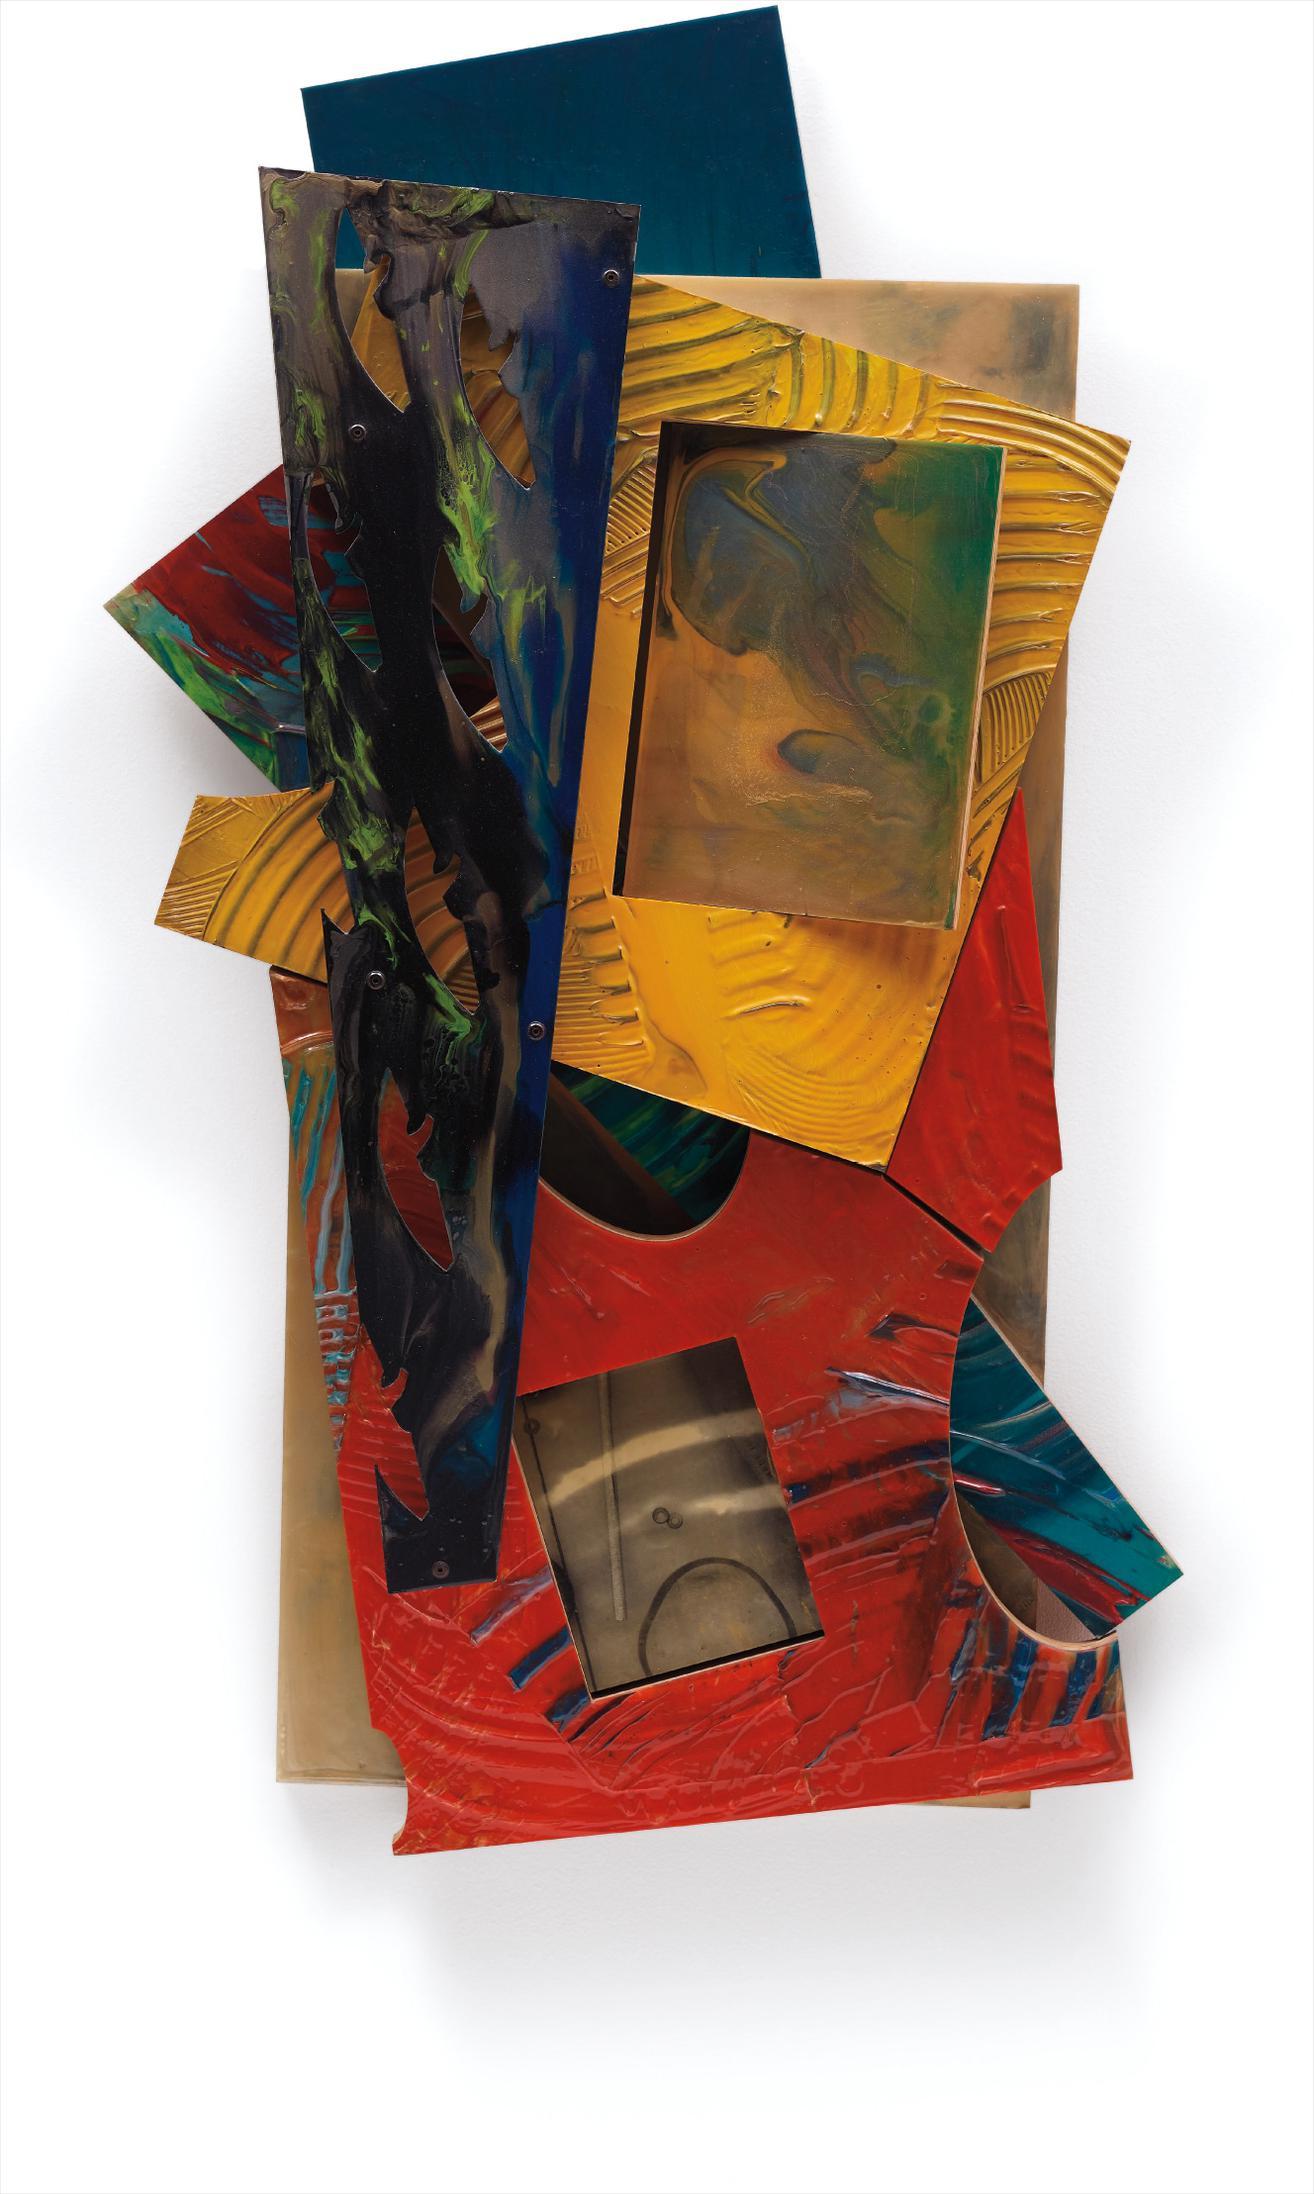 Sam Gilliam-All Colors Stacks-1996